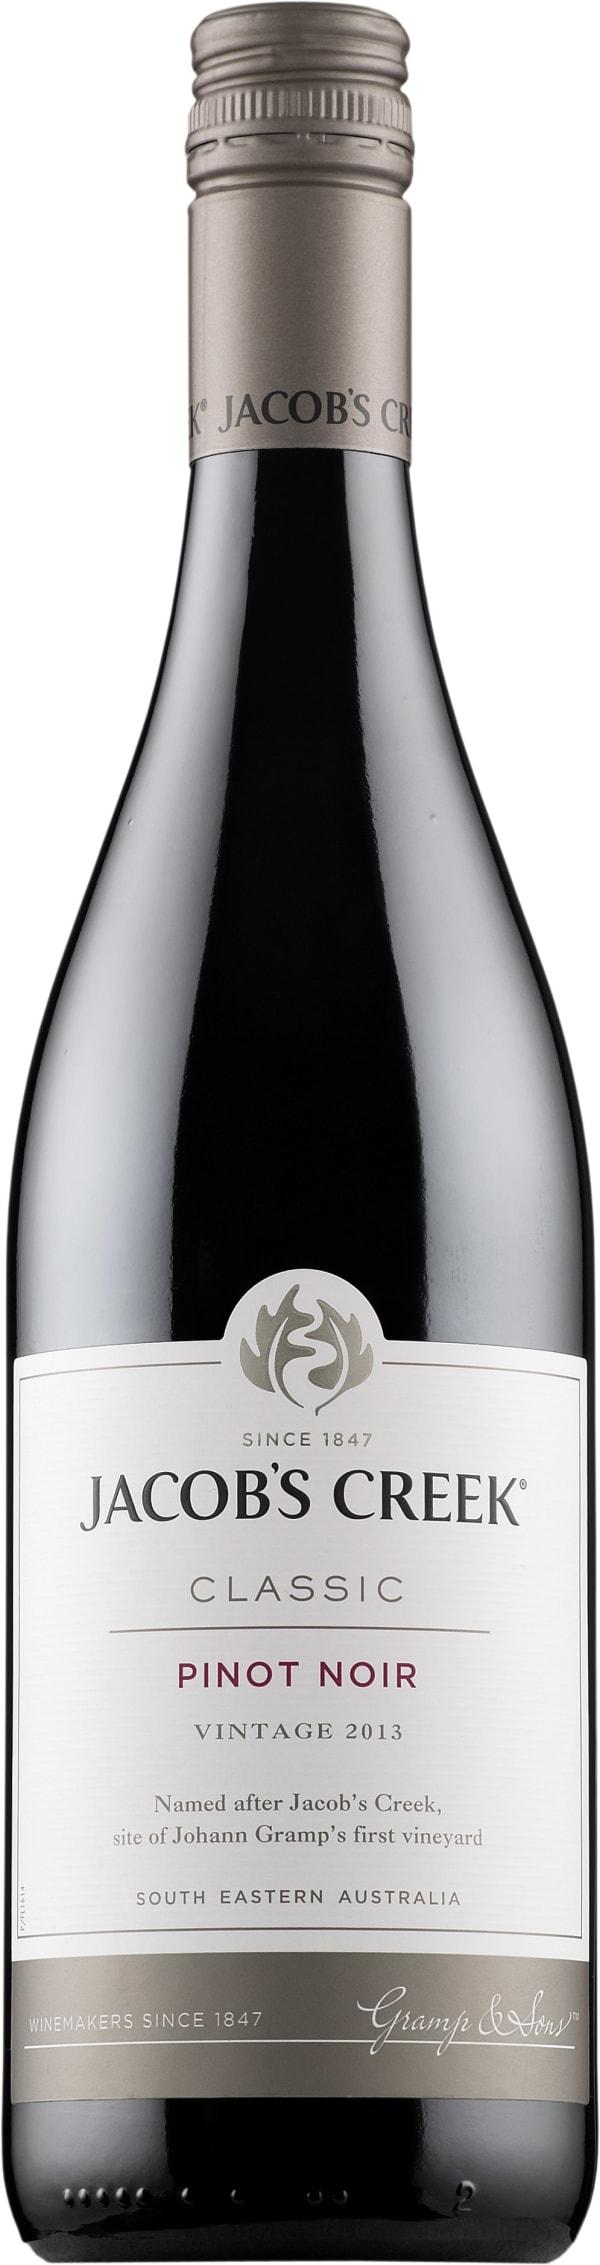 Jacob's Creek Pinot Noir 2015